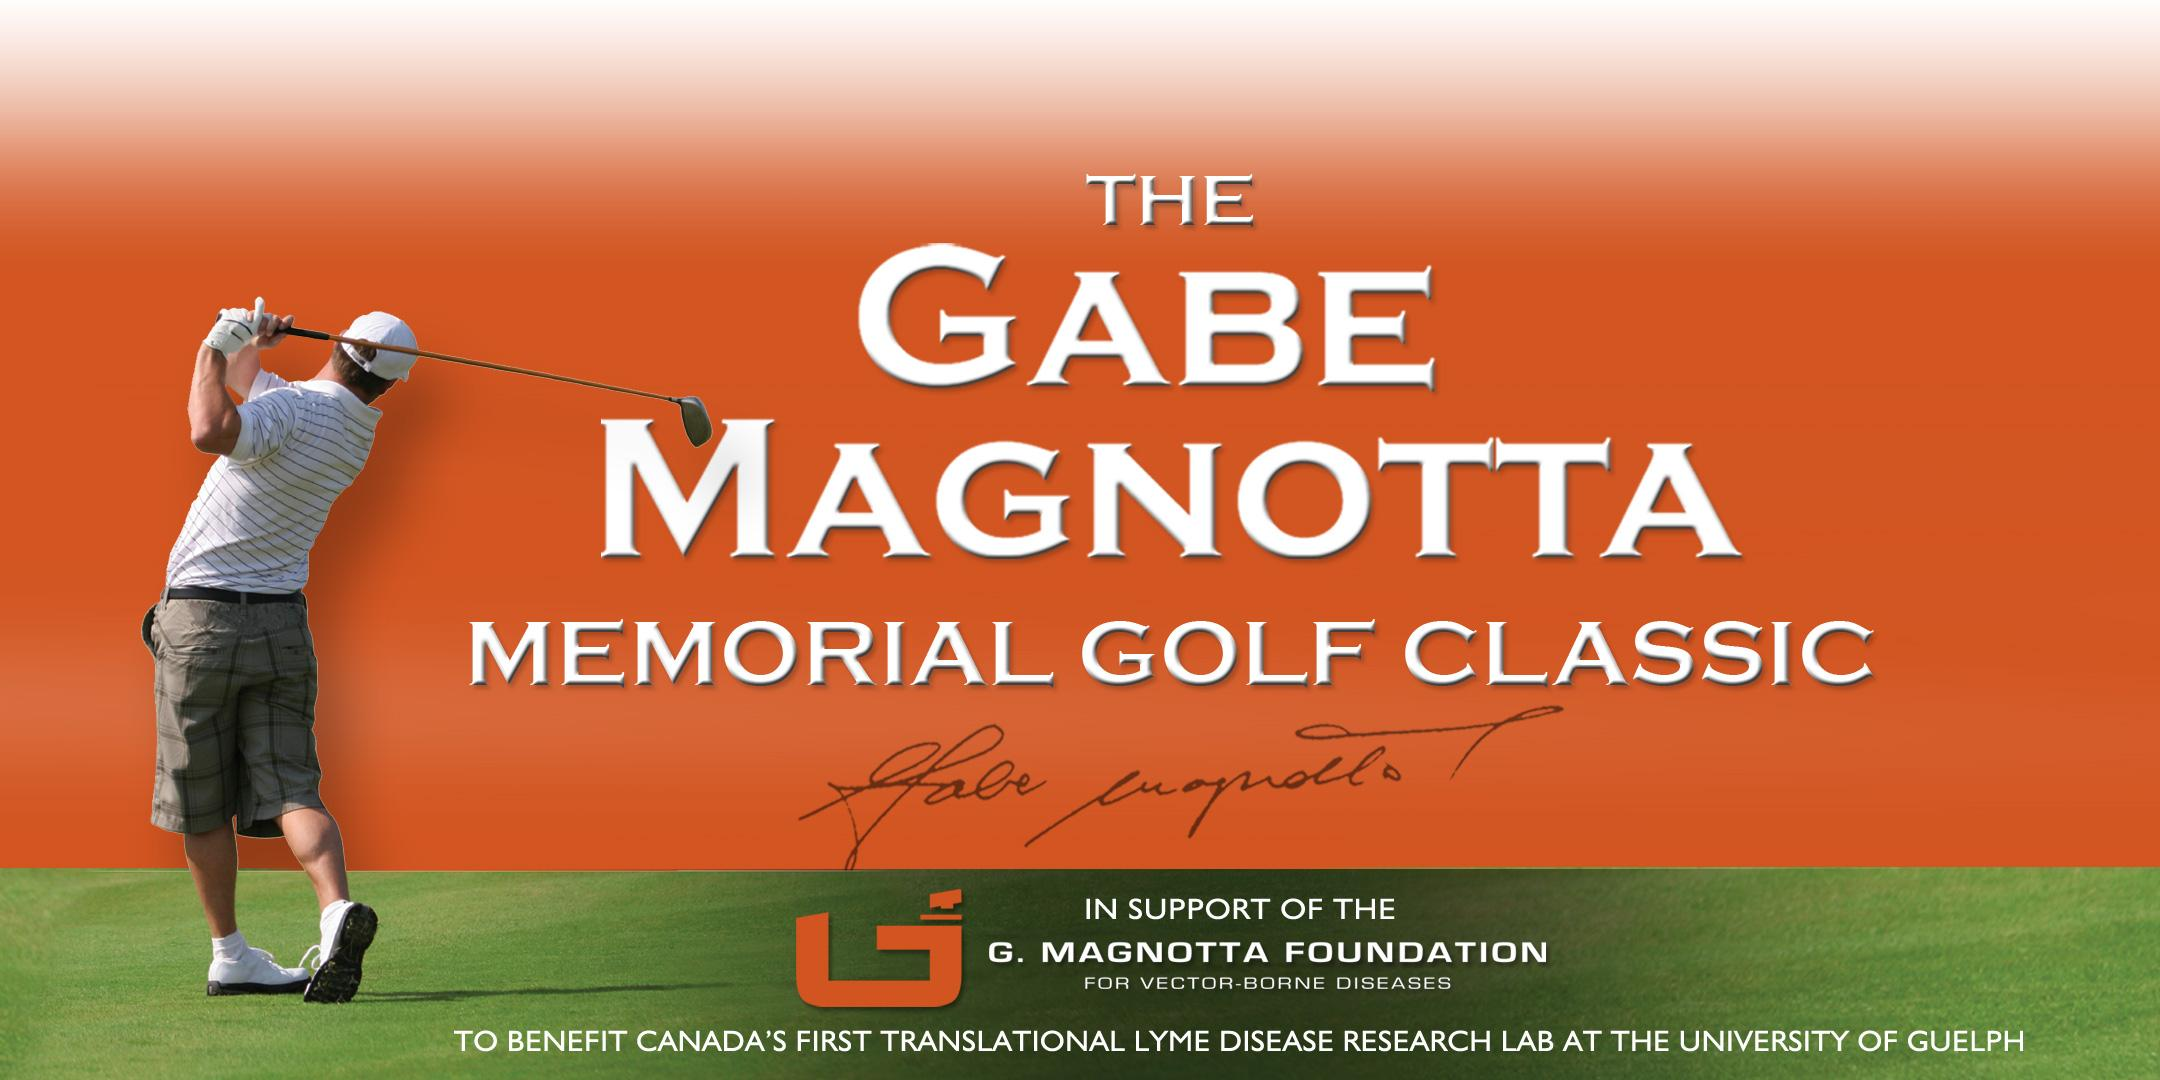 The Gabe Magnotta Memorial Golf Classic 2021